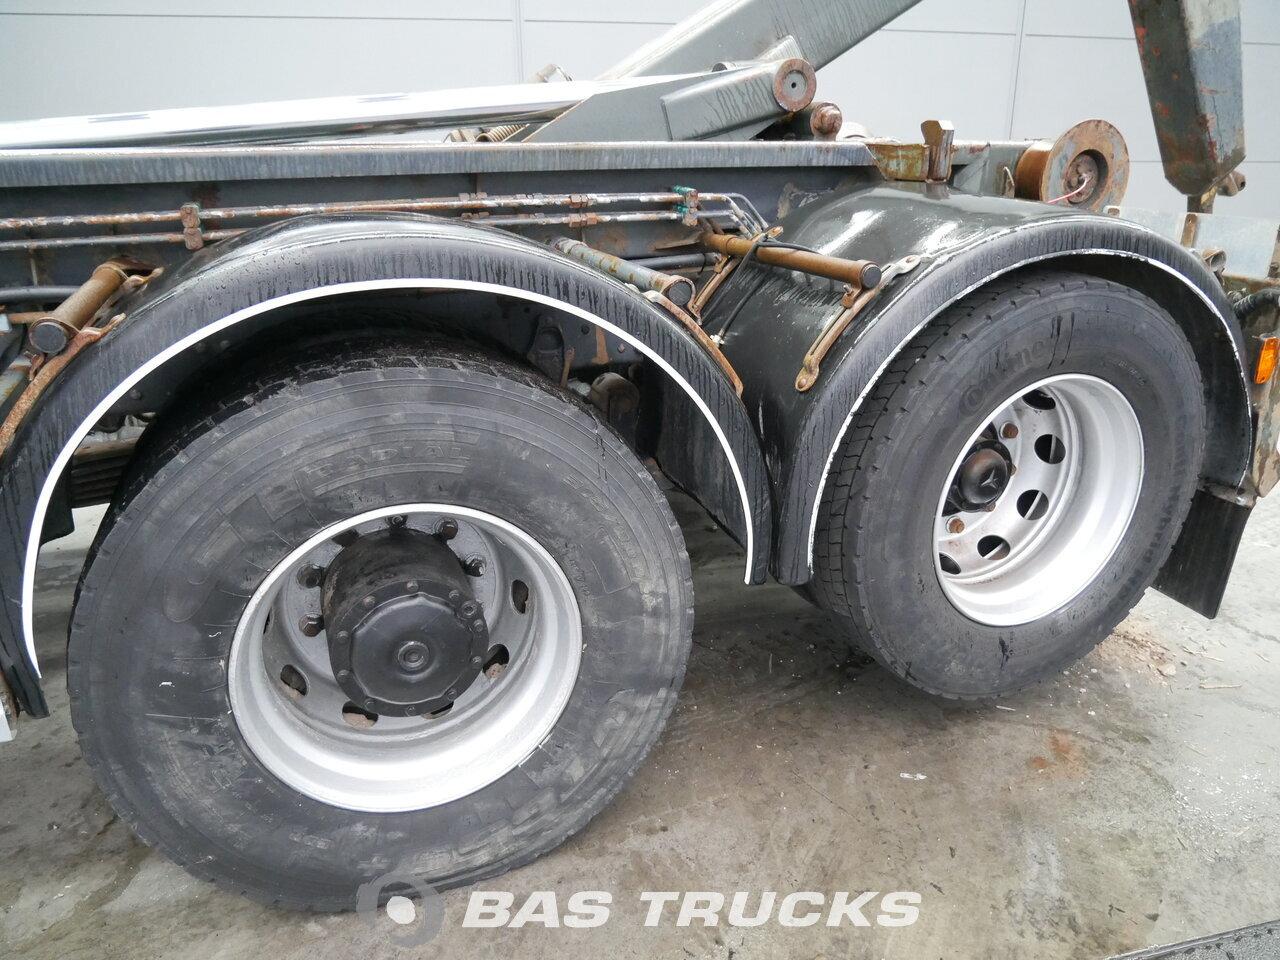 photo of Used Truck Mercedes Actros 2548 S Getriebeschaden 6X2 2000